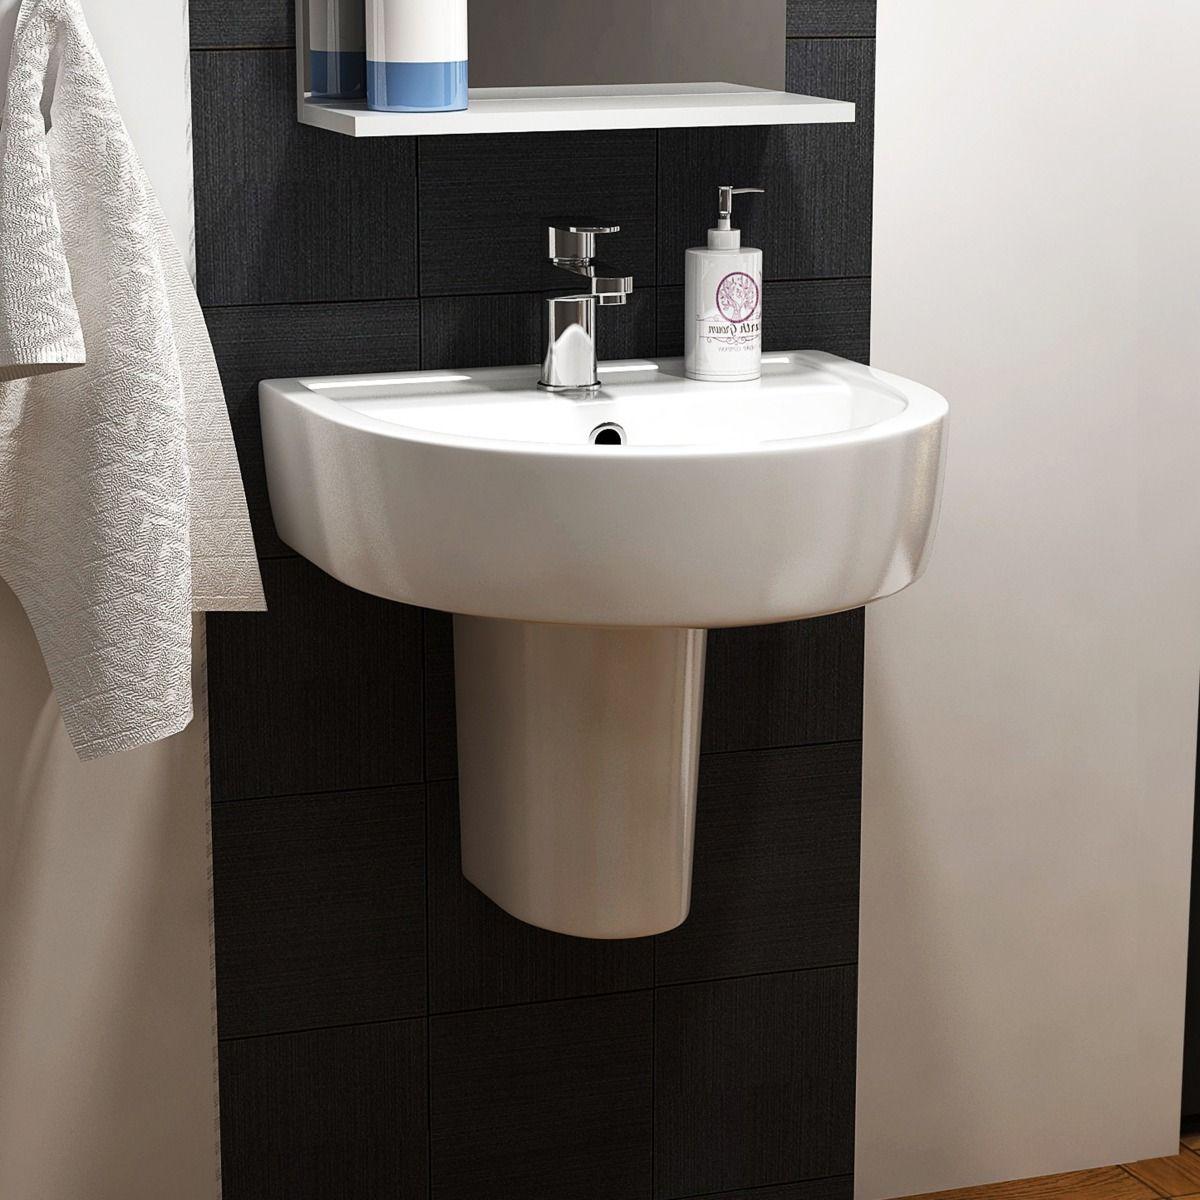 Semi Pedestal Basins - Buying Guide